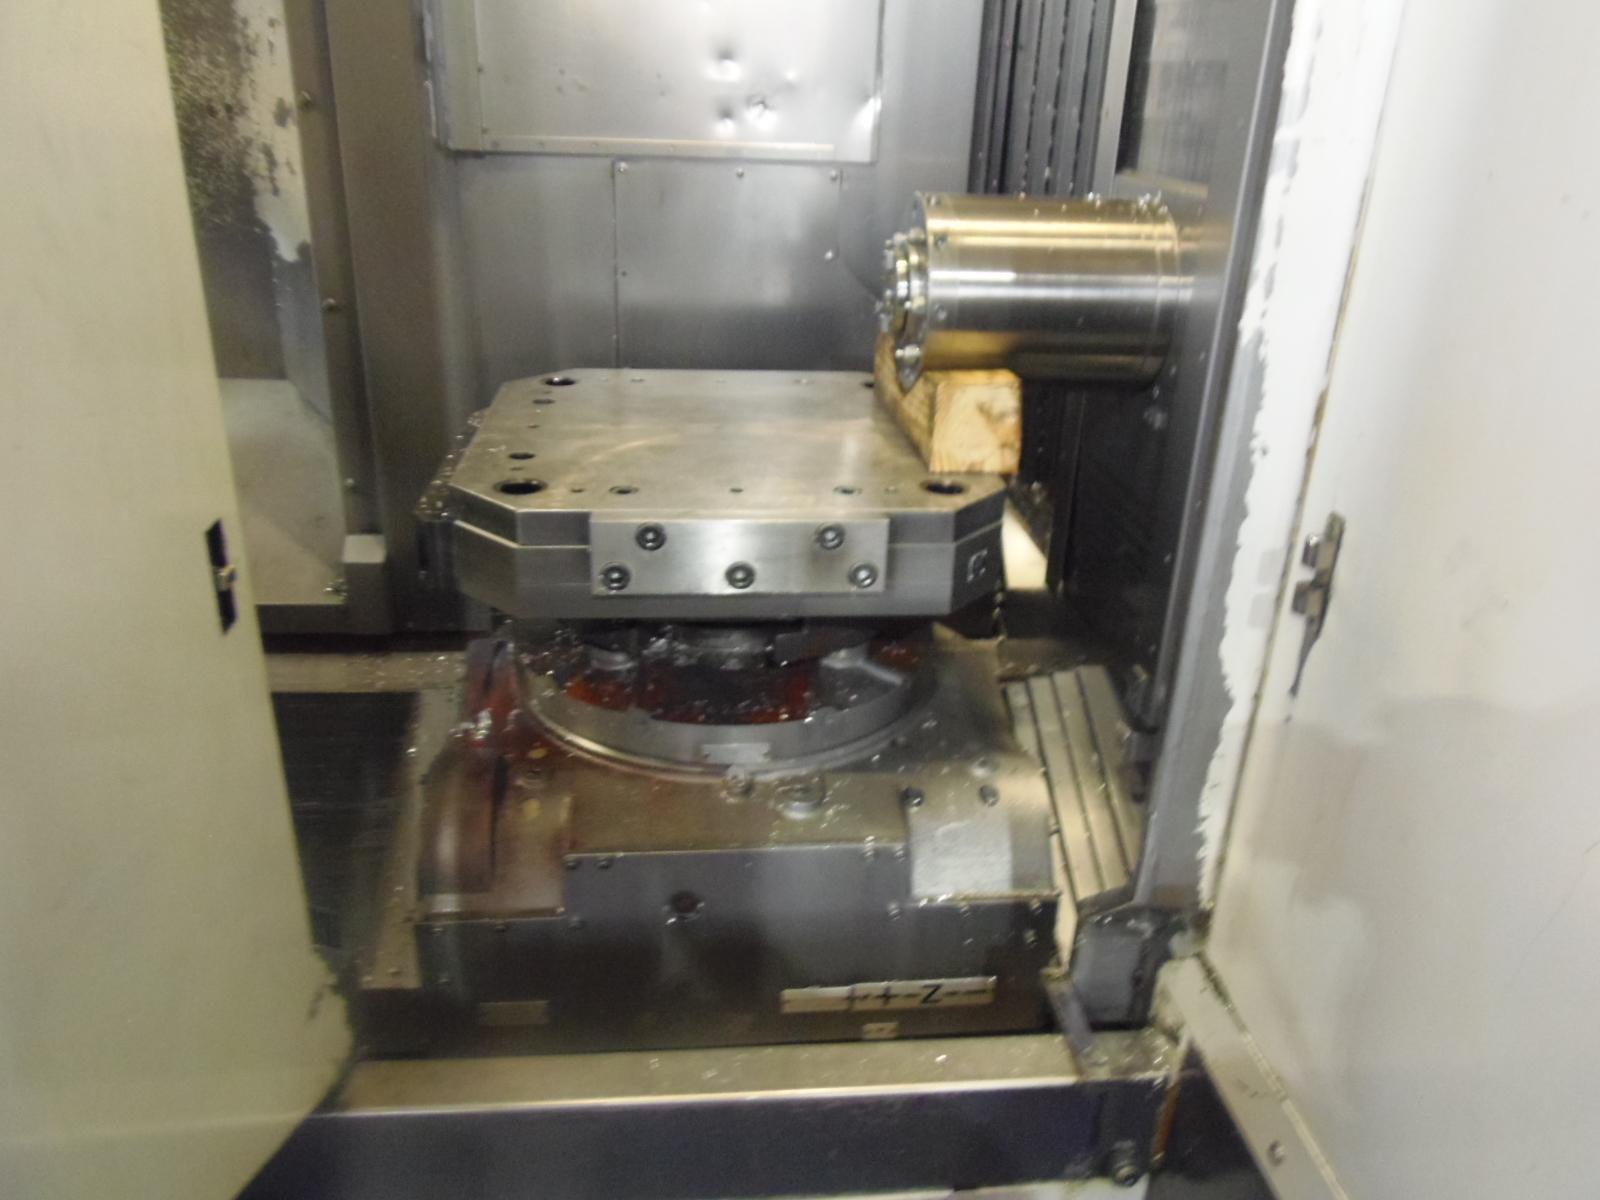 "ENSHU JE80S, 2006, 20"" PALLETS, TSC, 18iMB CONTROL, 31 X 31 X 31 TRAVELS, BT-40 TAPER, 15,000 RPM, HYD. FIXTURE INTERFACE"